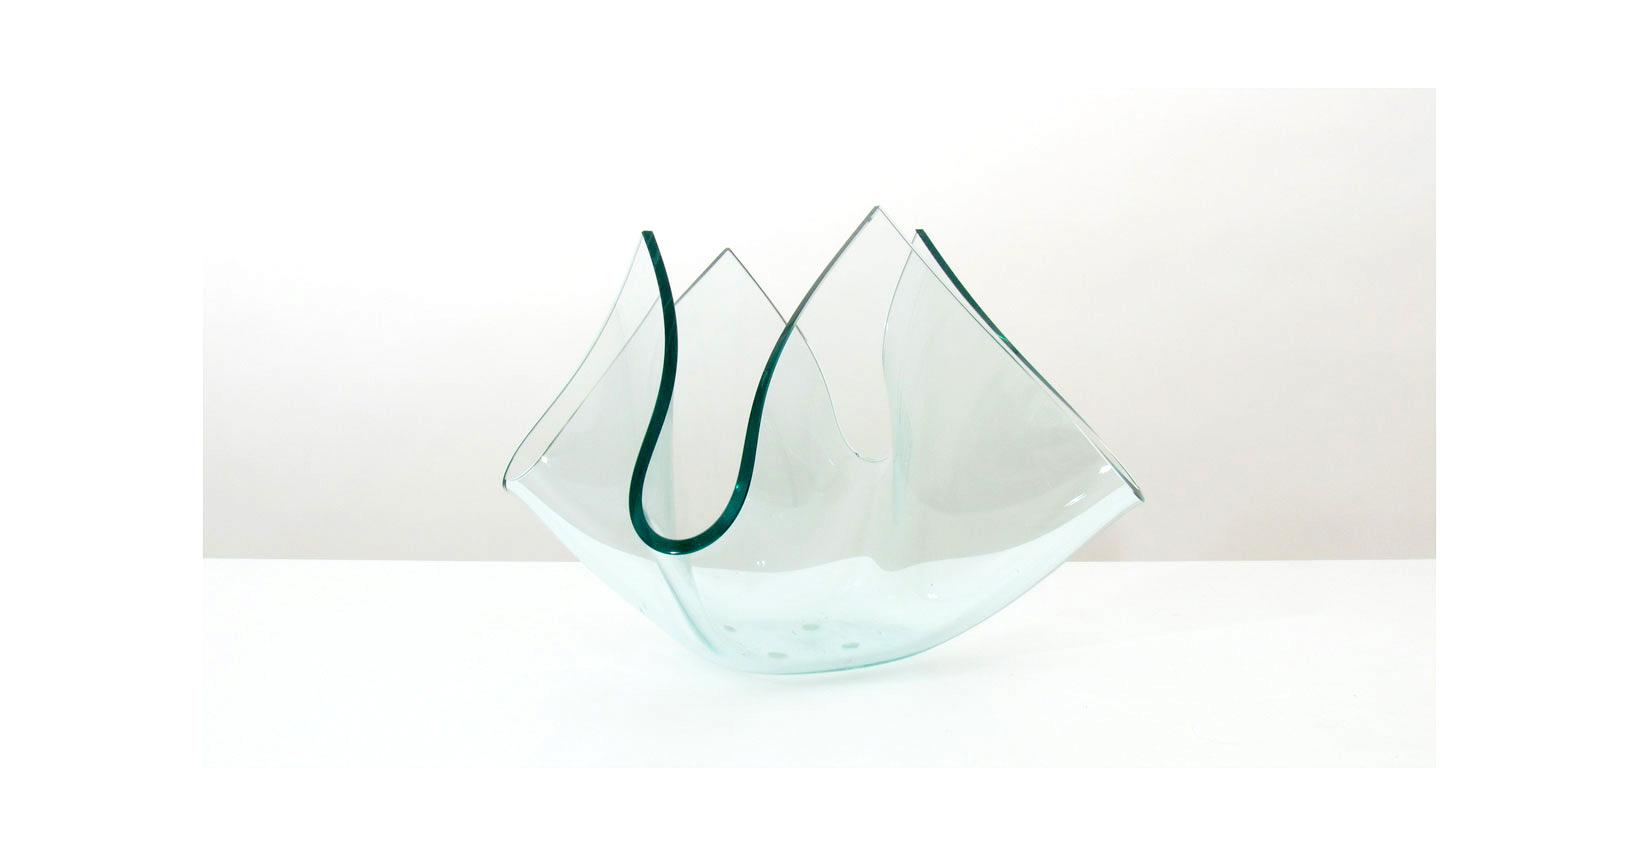 cartoccio fontanaArte vetro glass design fontana arte cristallo pietro chiesa